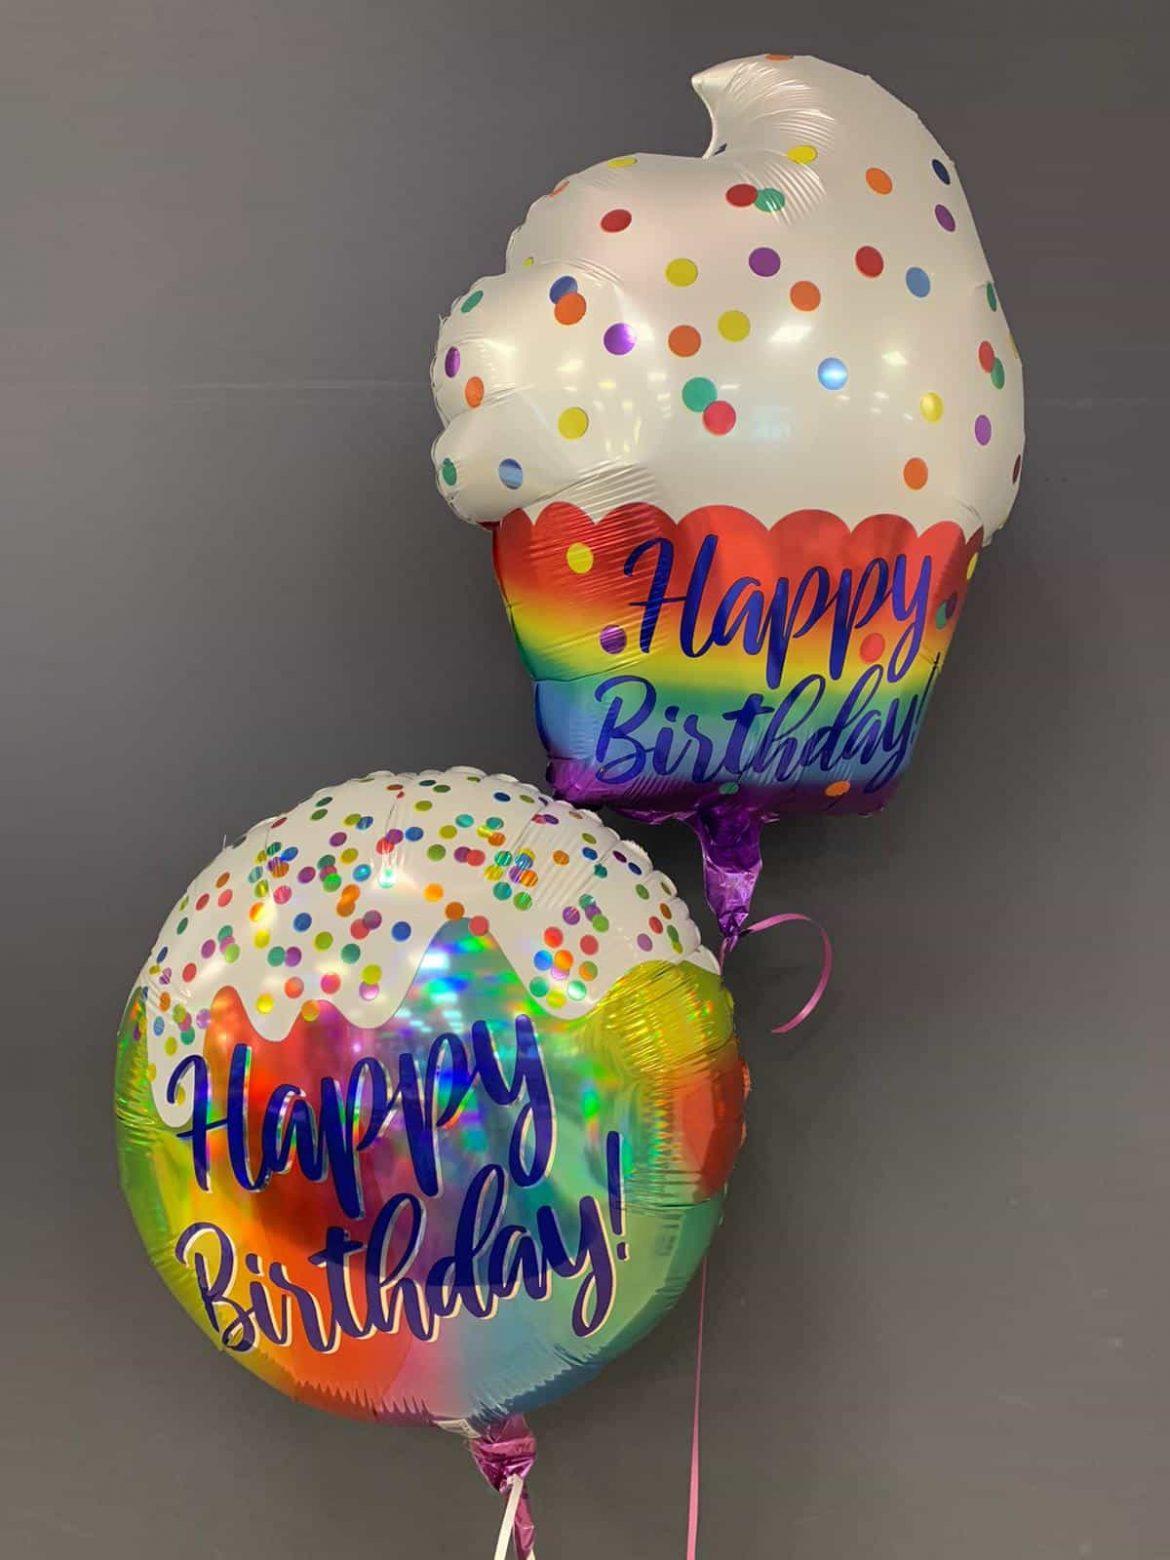 Happy Birthday<br>Cupcake € 5,90<br>runder Ballon € 5,50 1